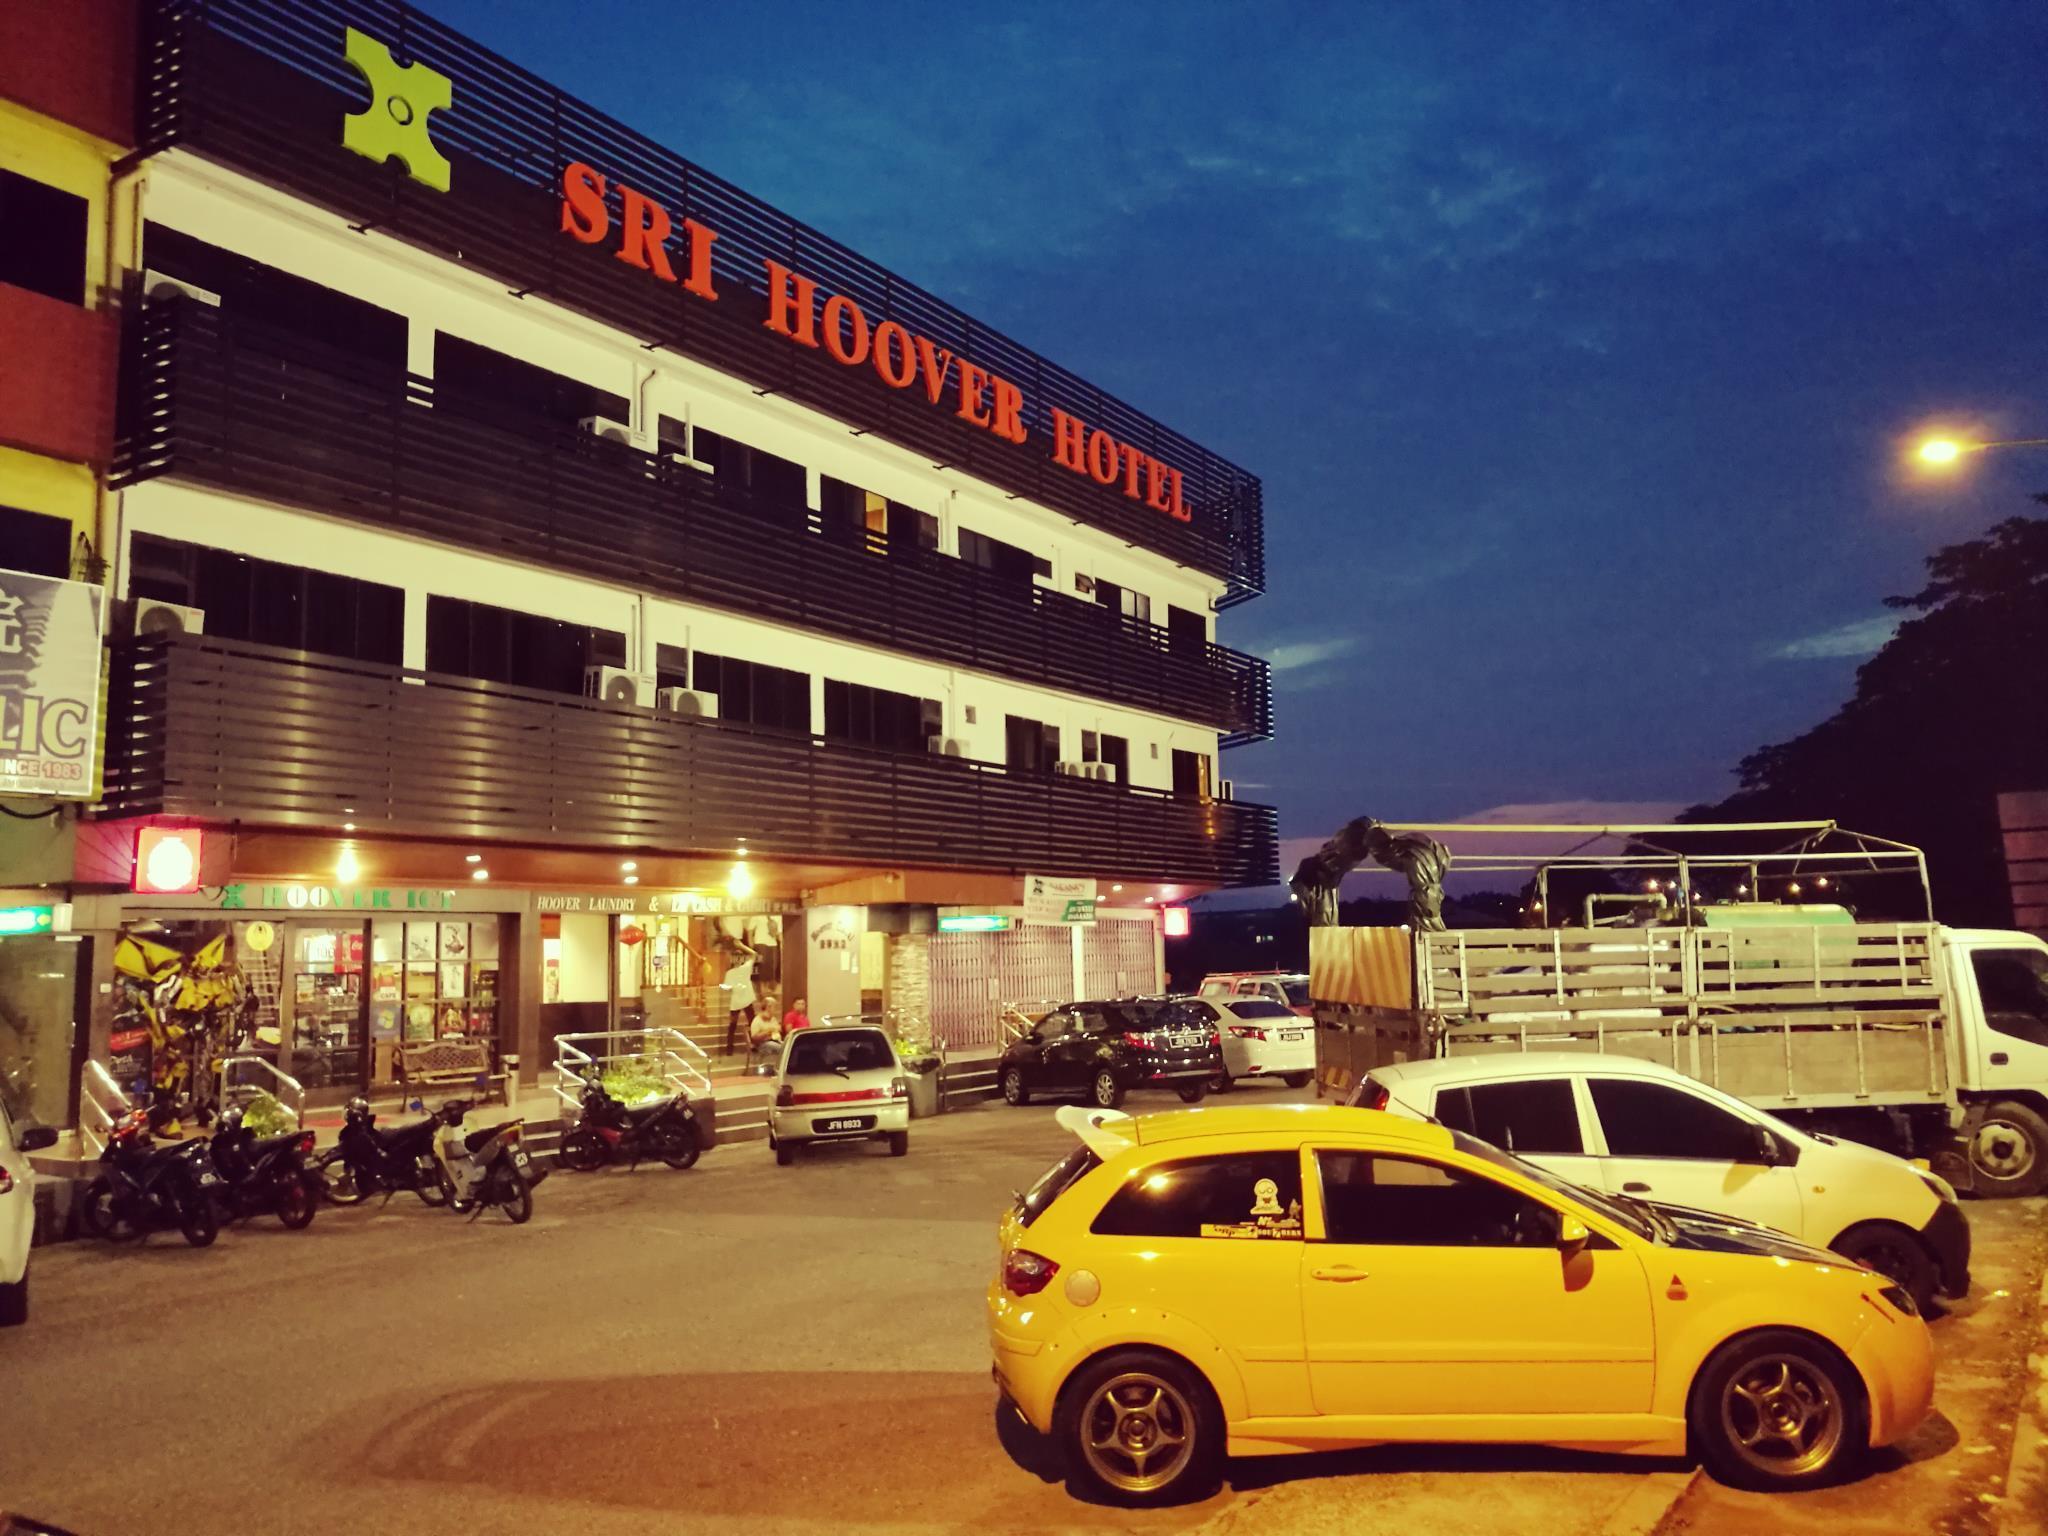 Sri Hoover Hotel, Kulaijaya